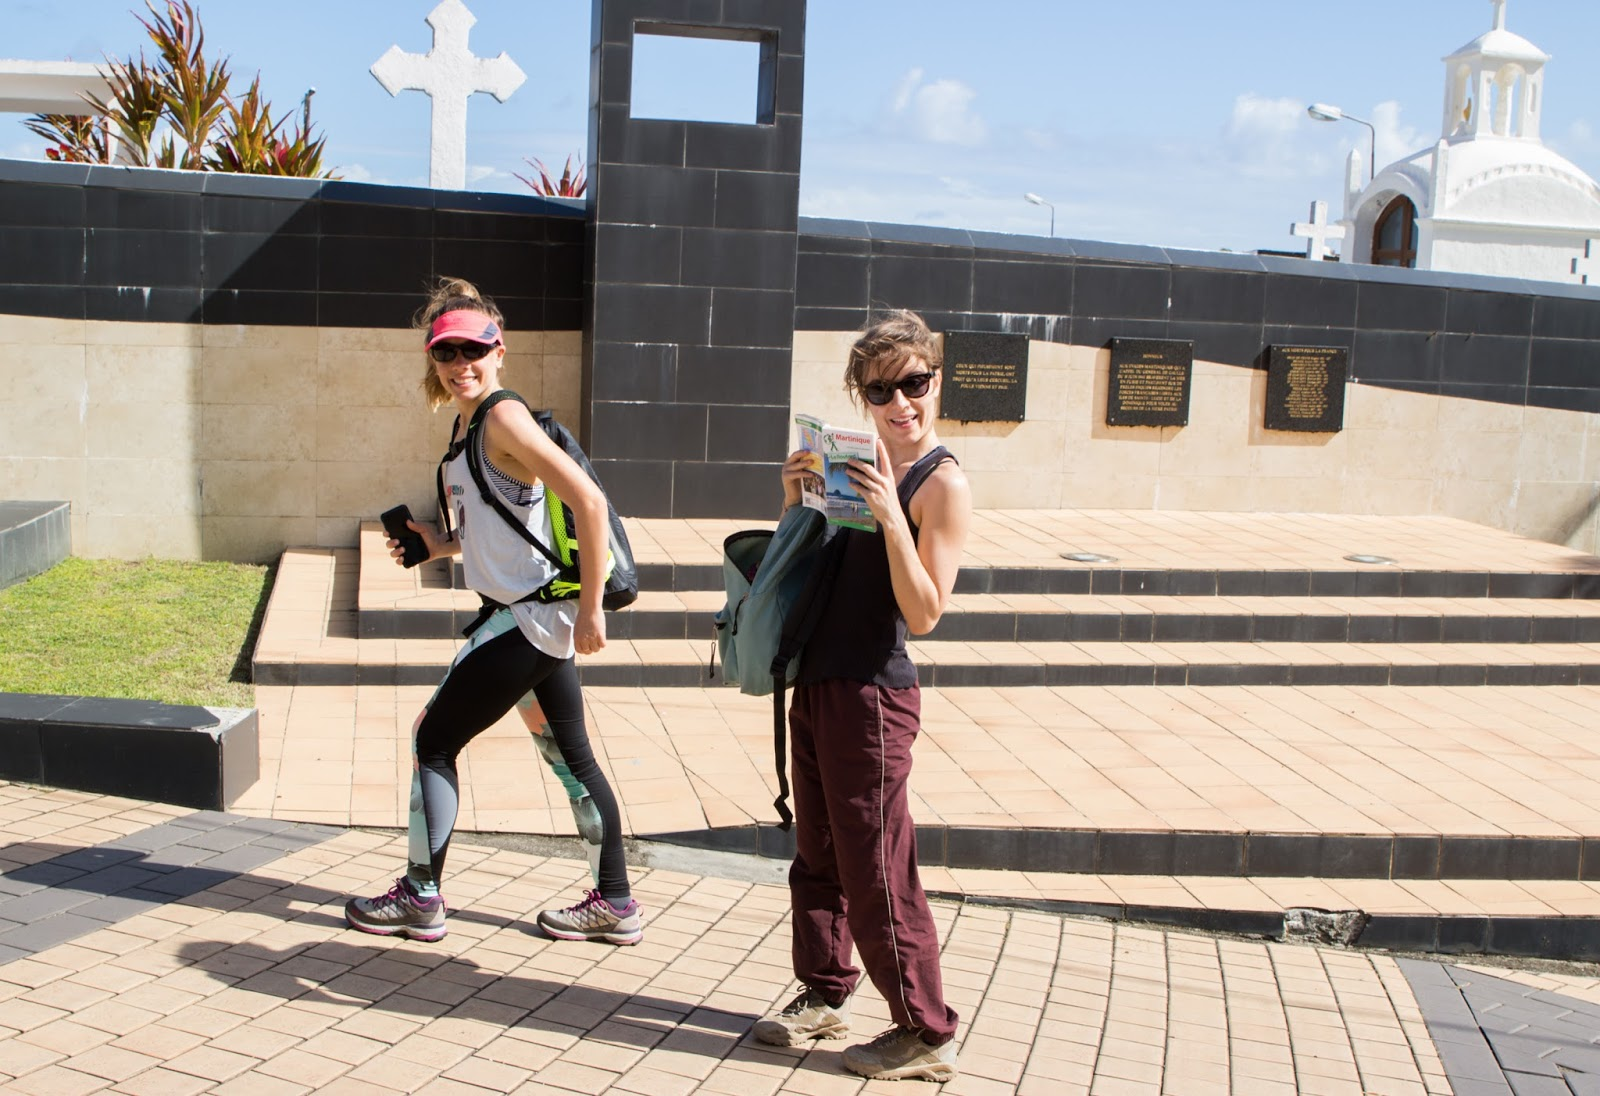 Randonnée blog voyage sport